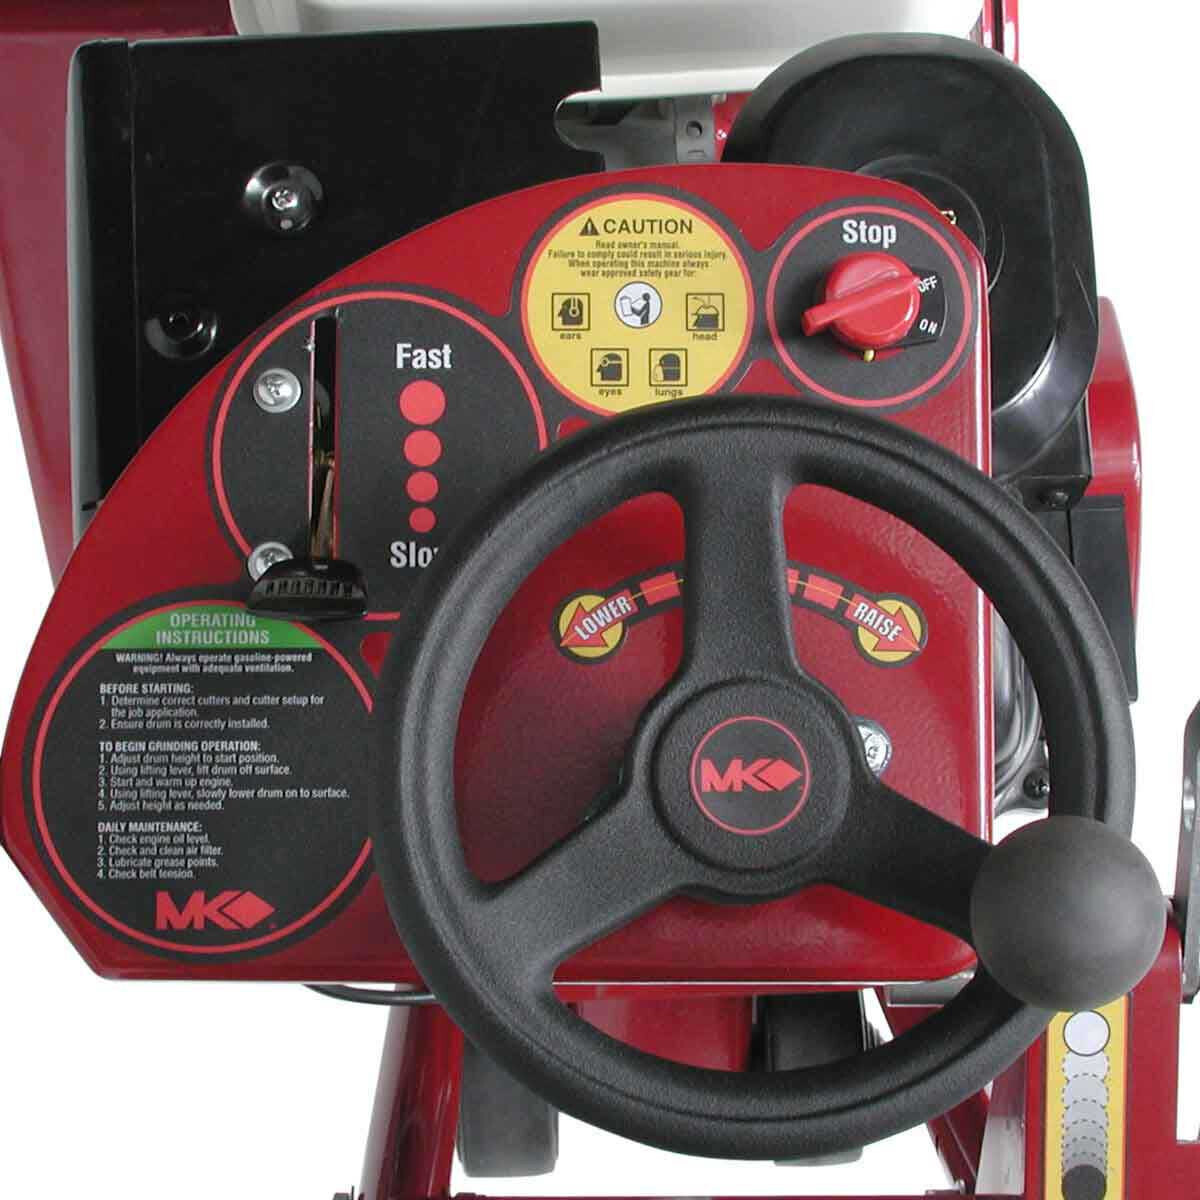 MK-SG-9 Scarifier Controls